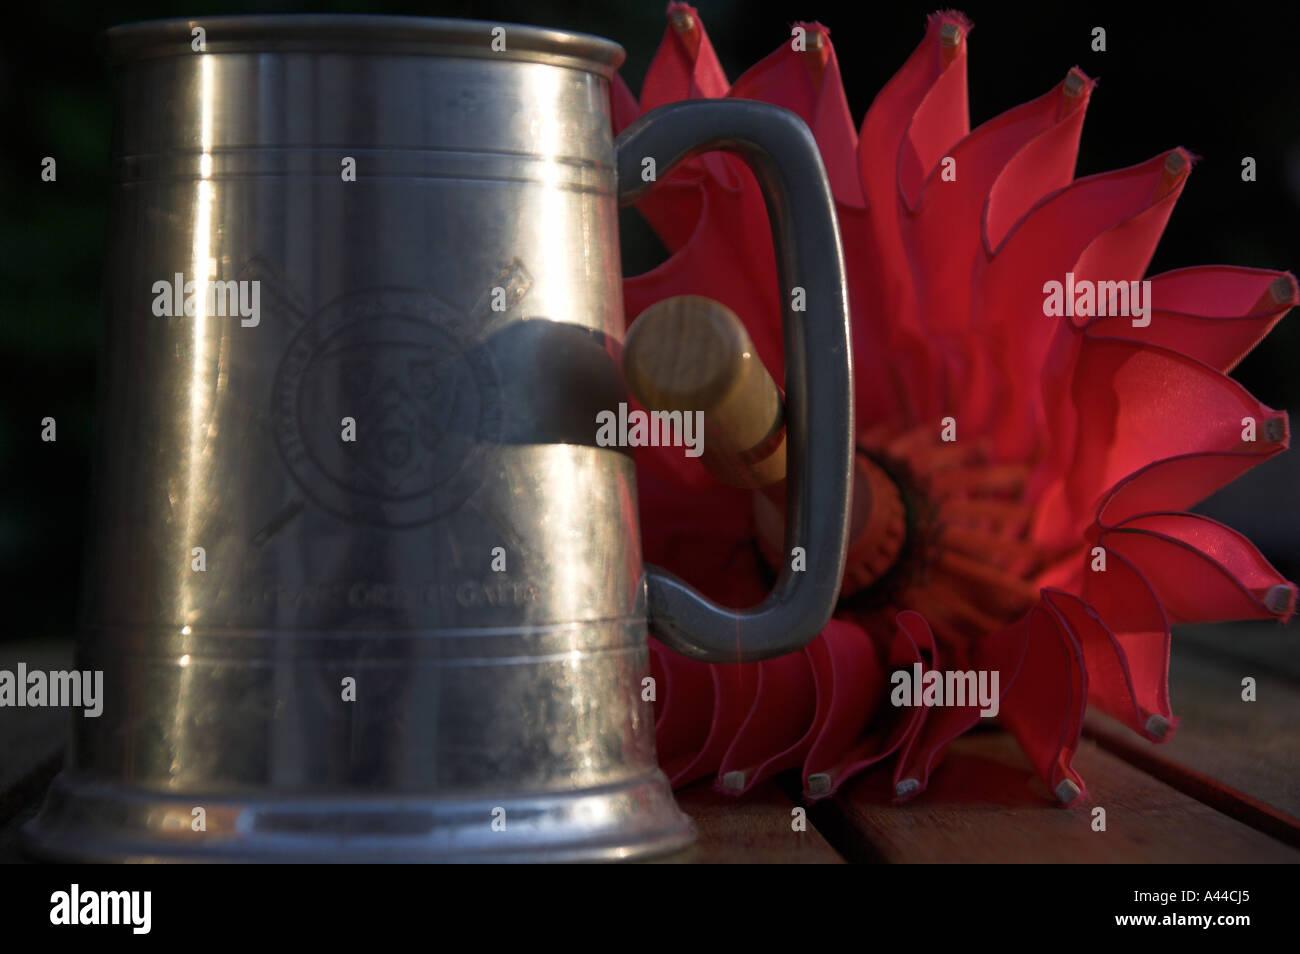 pewter mug with parasol handle - Stock Image